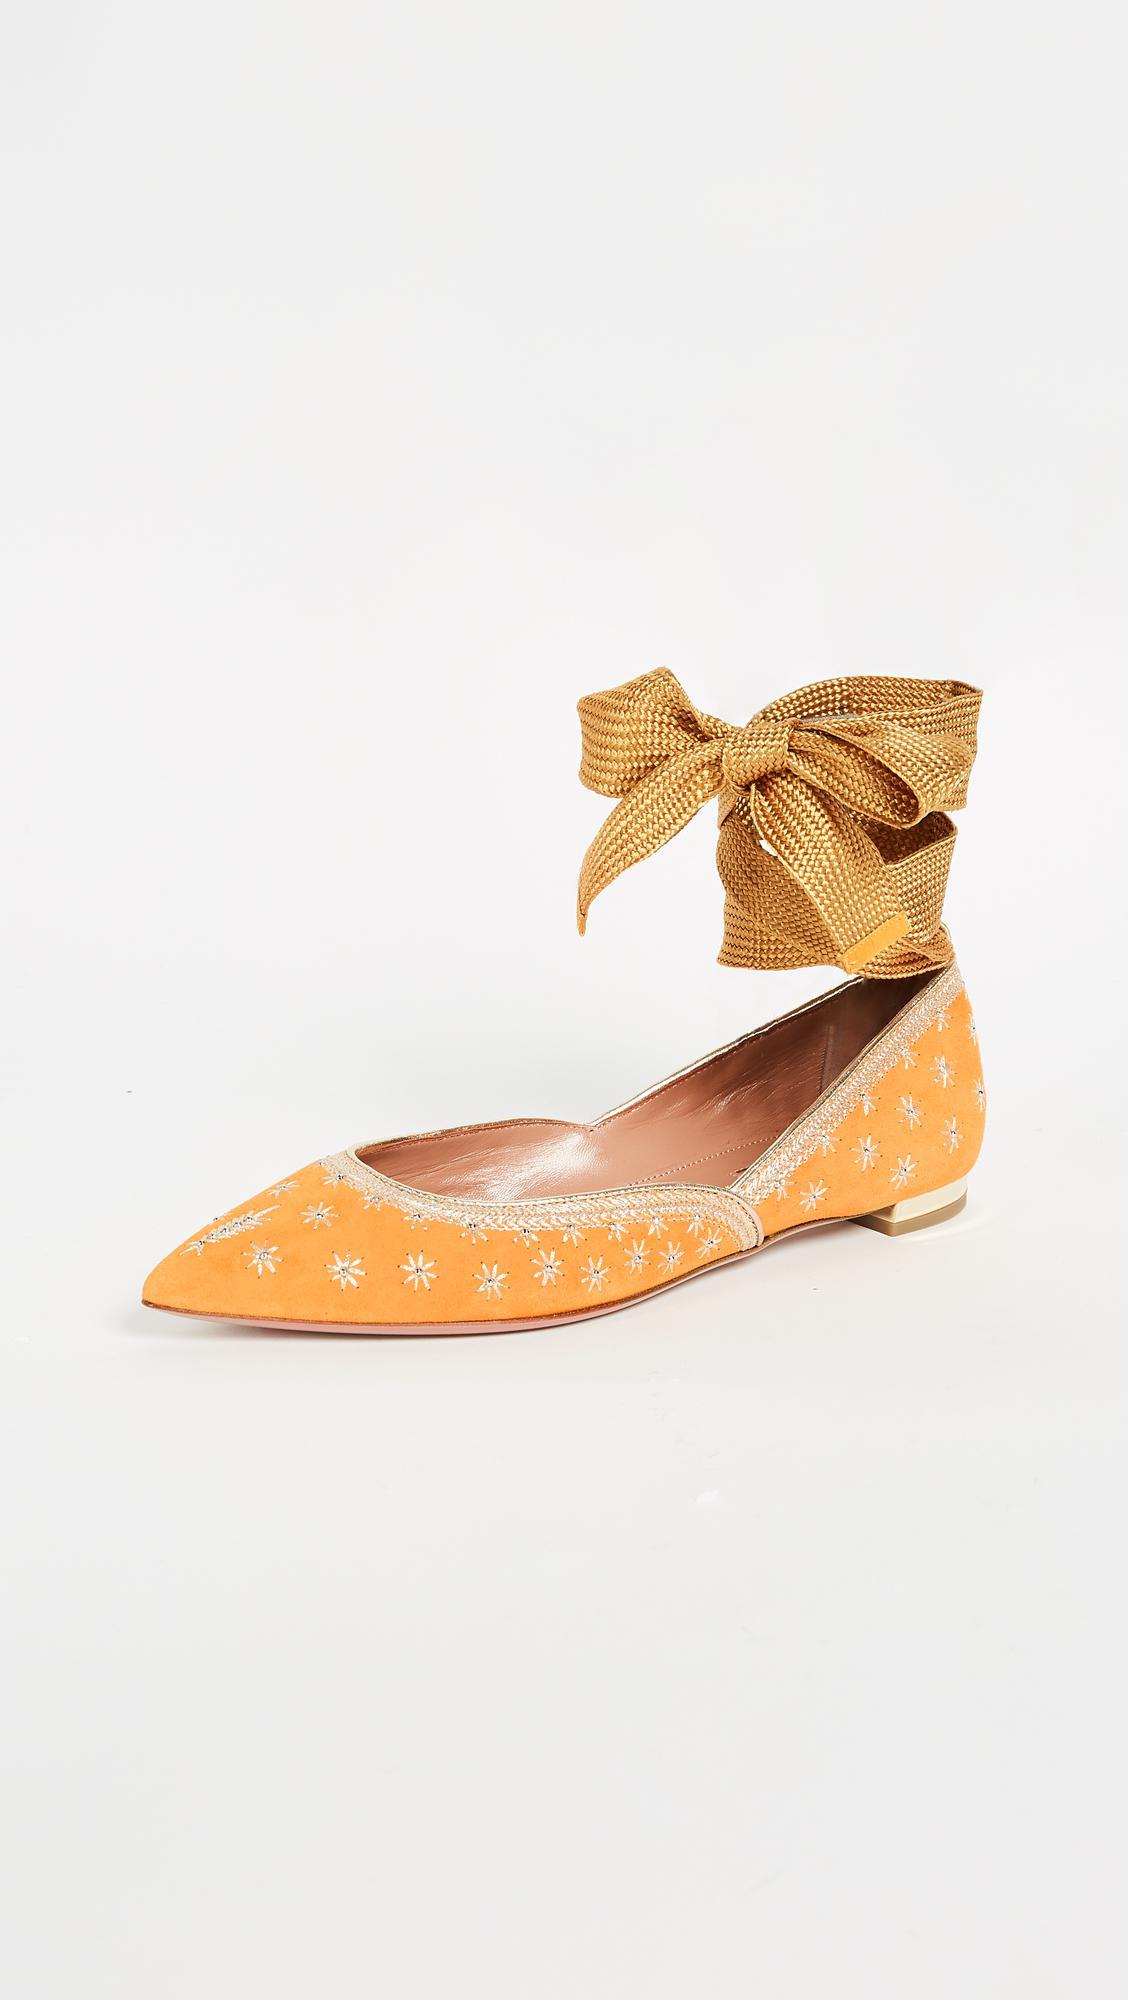 Bliss ankle-wrap ballerinas - Yellow & Orange Aquazzura yKJFtUI